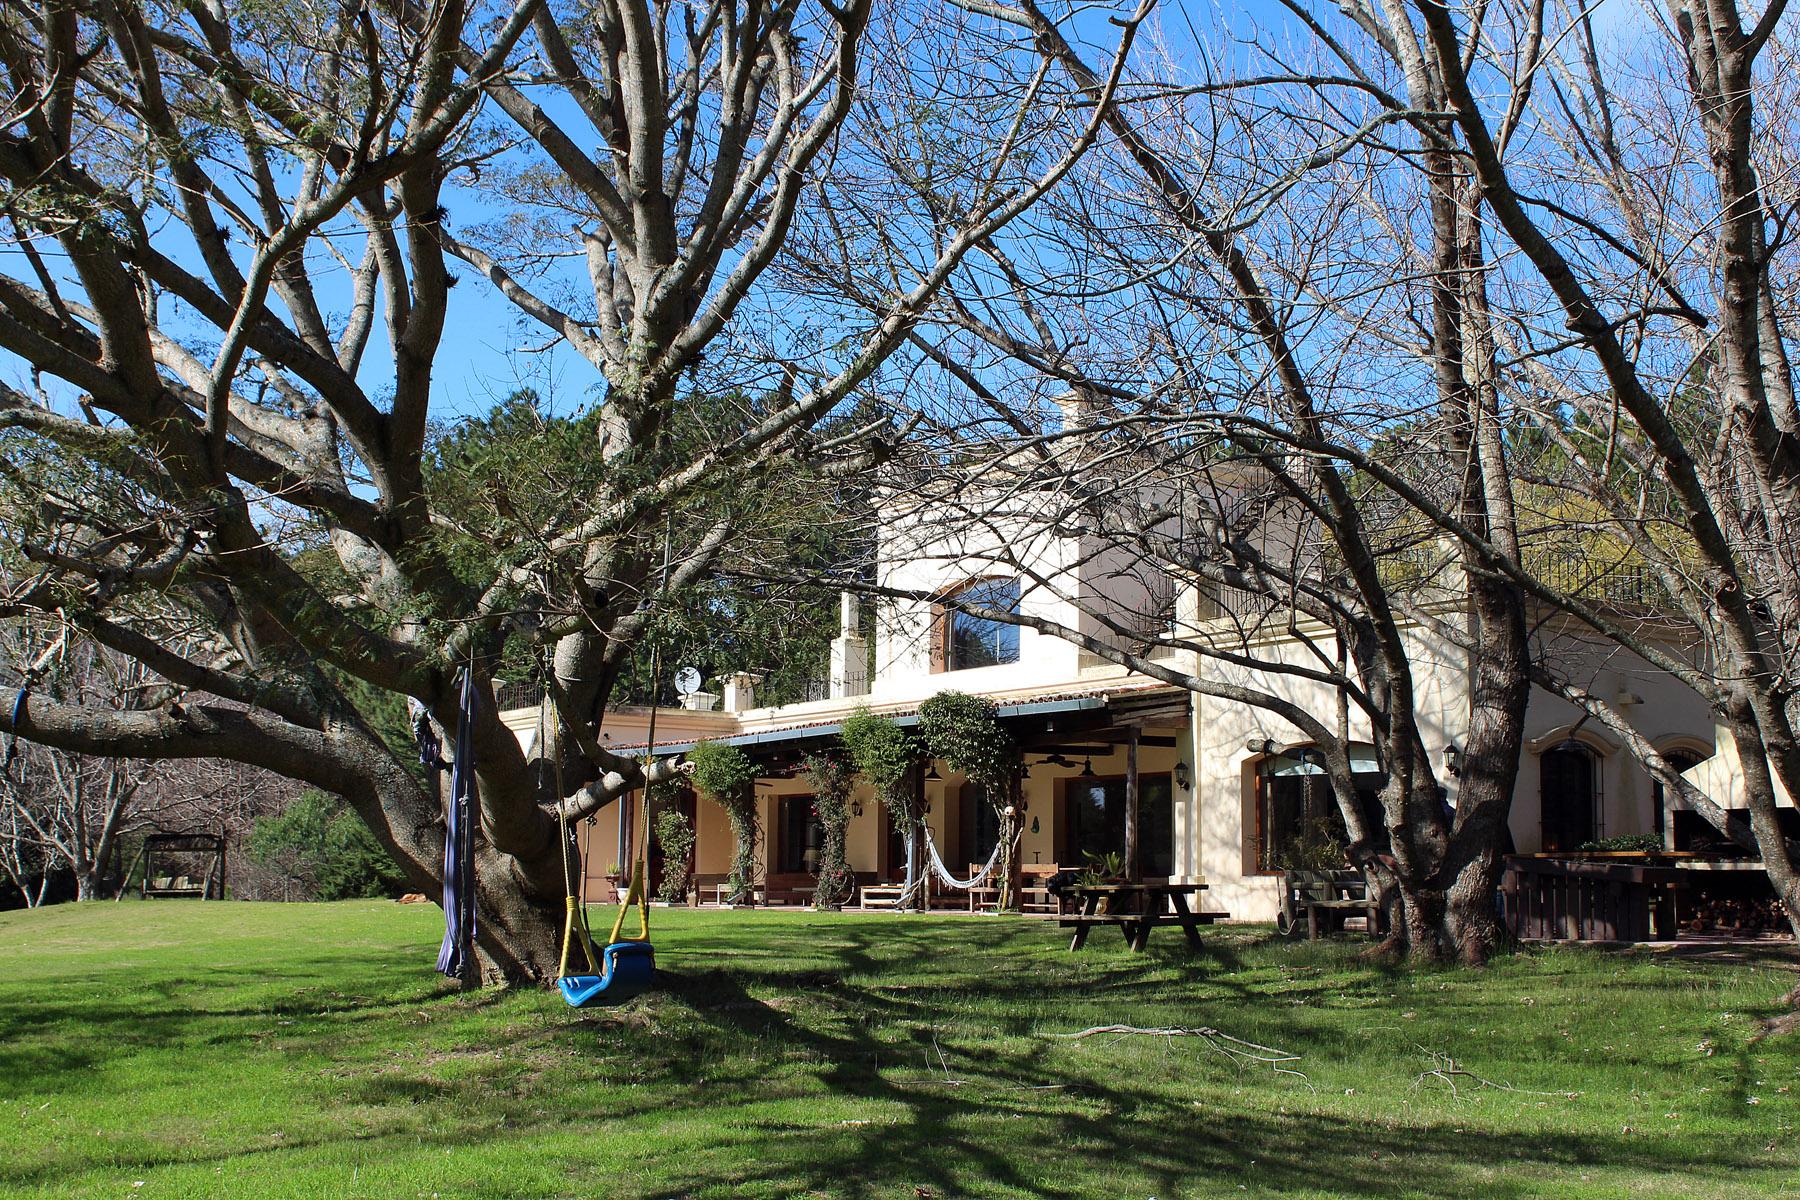 农场 / 牧场 / 种植园 为 销售 在 8.3 hectares ranch - La Oriental Camino de los Flamencos 巴拉, 马尔多纳多 20000 乌拉圭